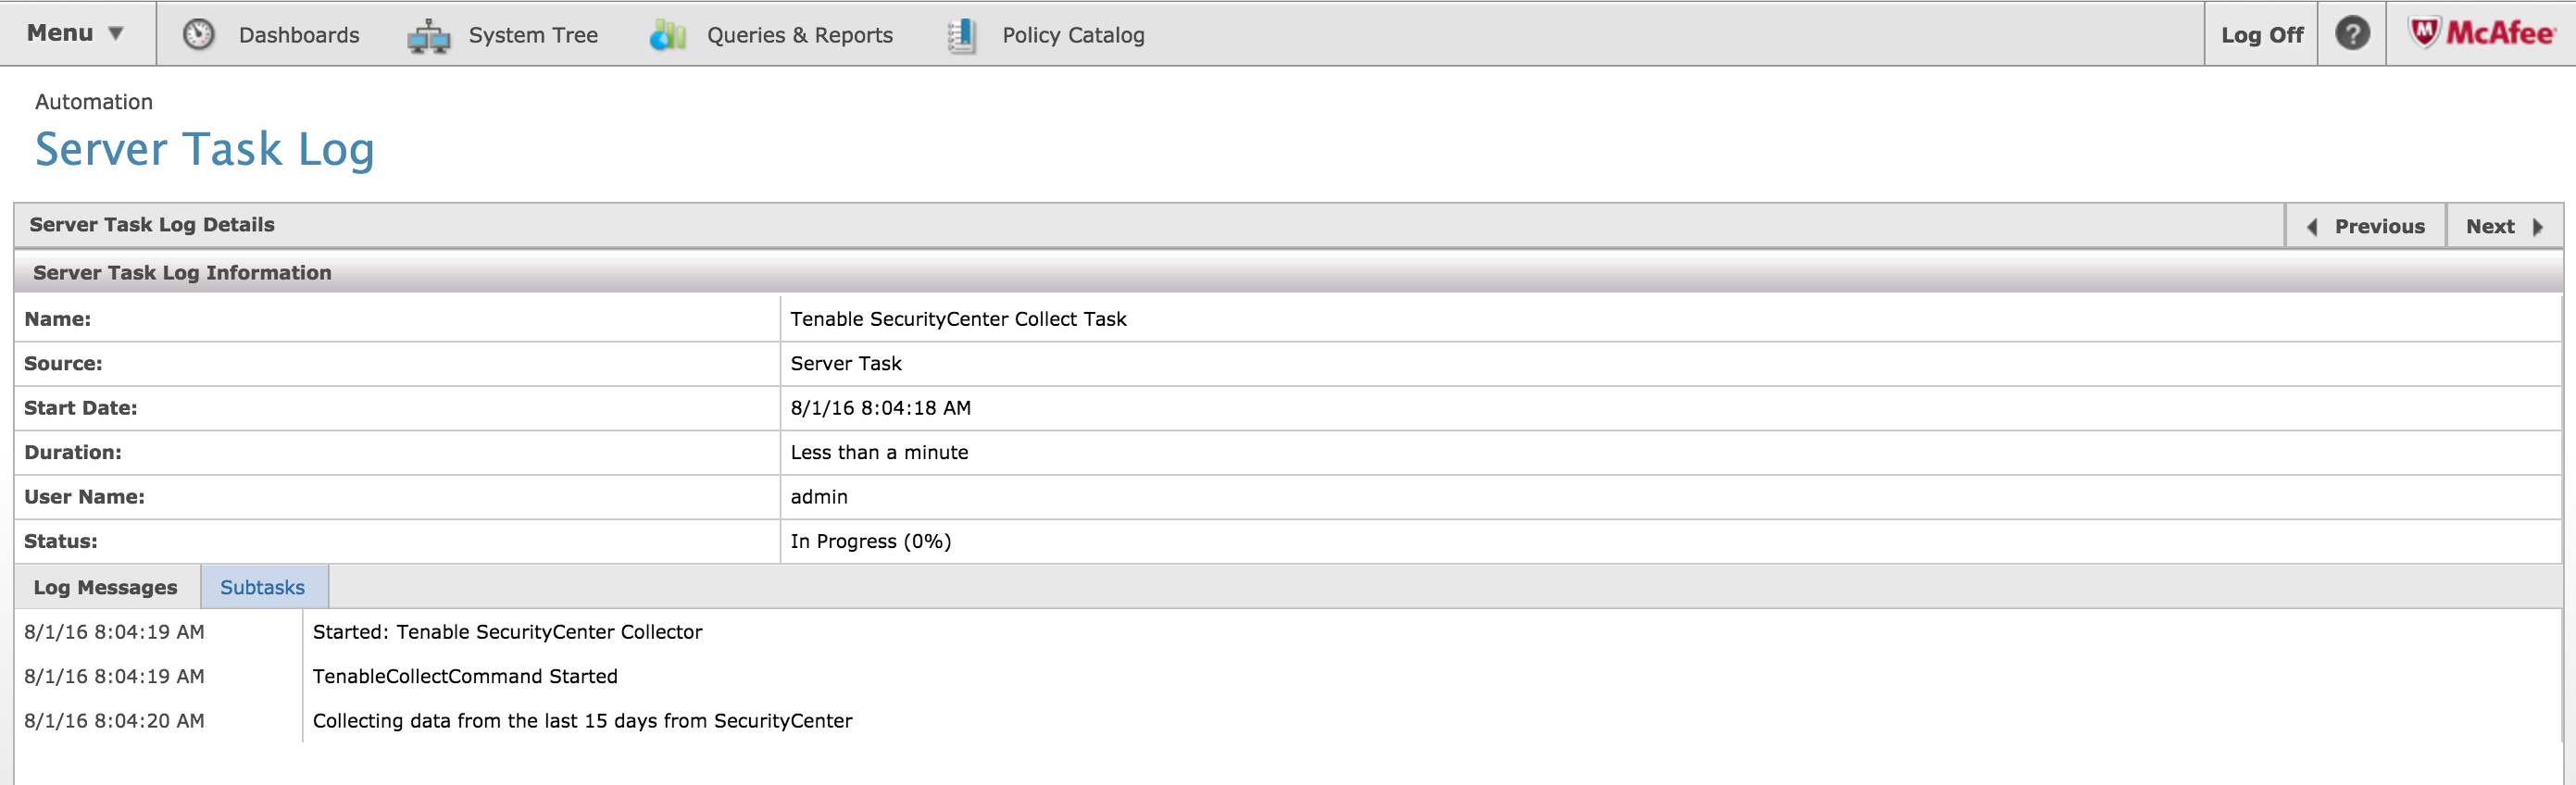 Server Task Log status